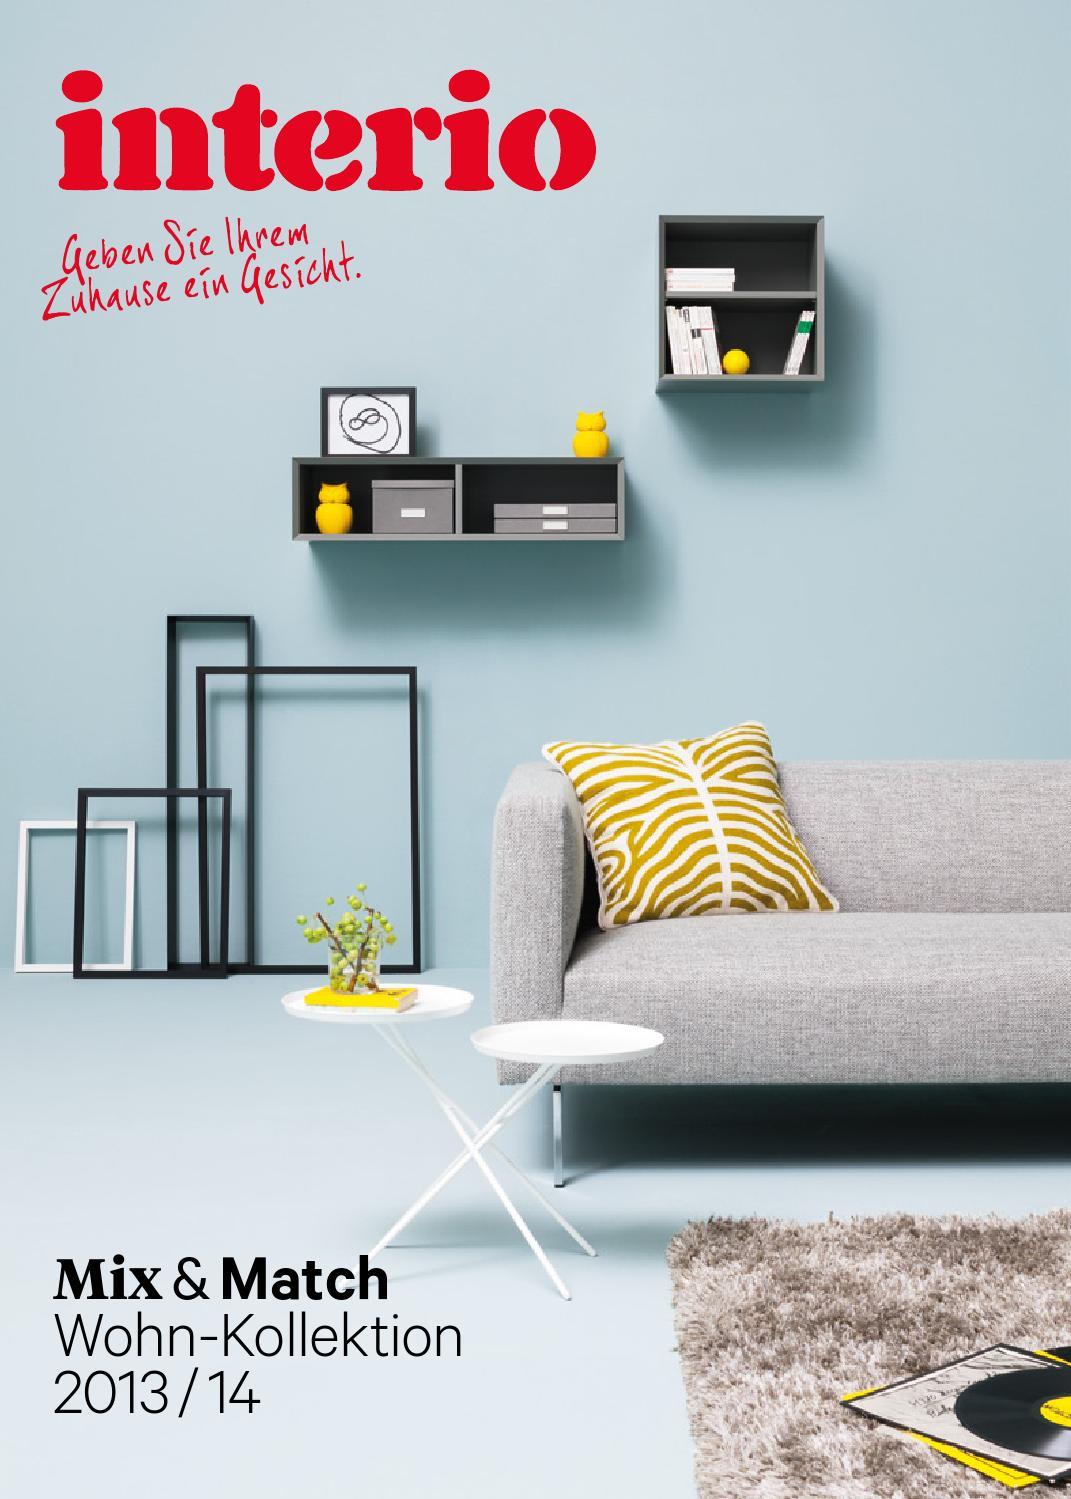 interio katalog g ltig bis 31 12 by broshuri issuu. Black Bedroom Furniture Sets. Home Design Ideas